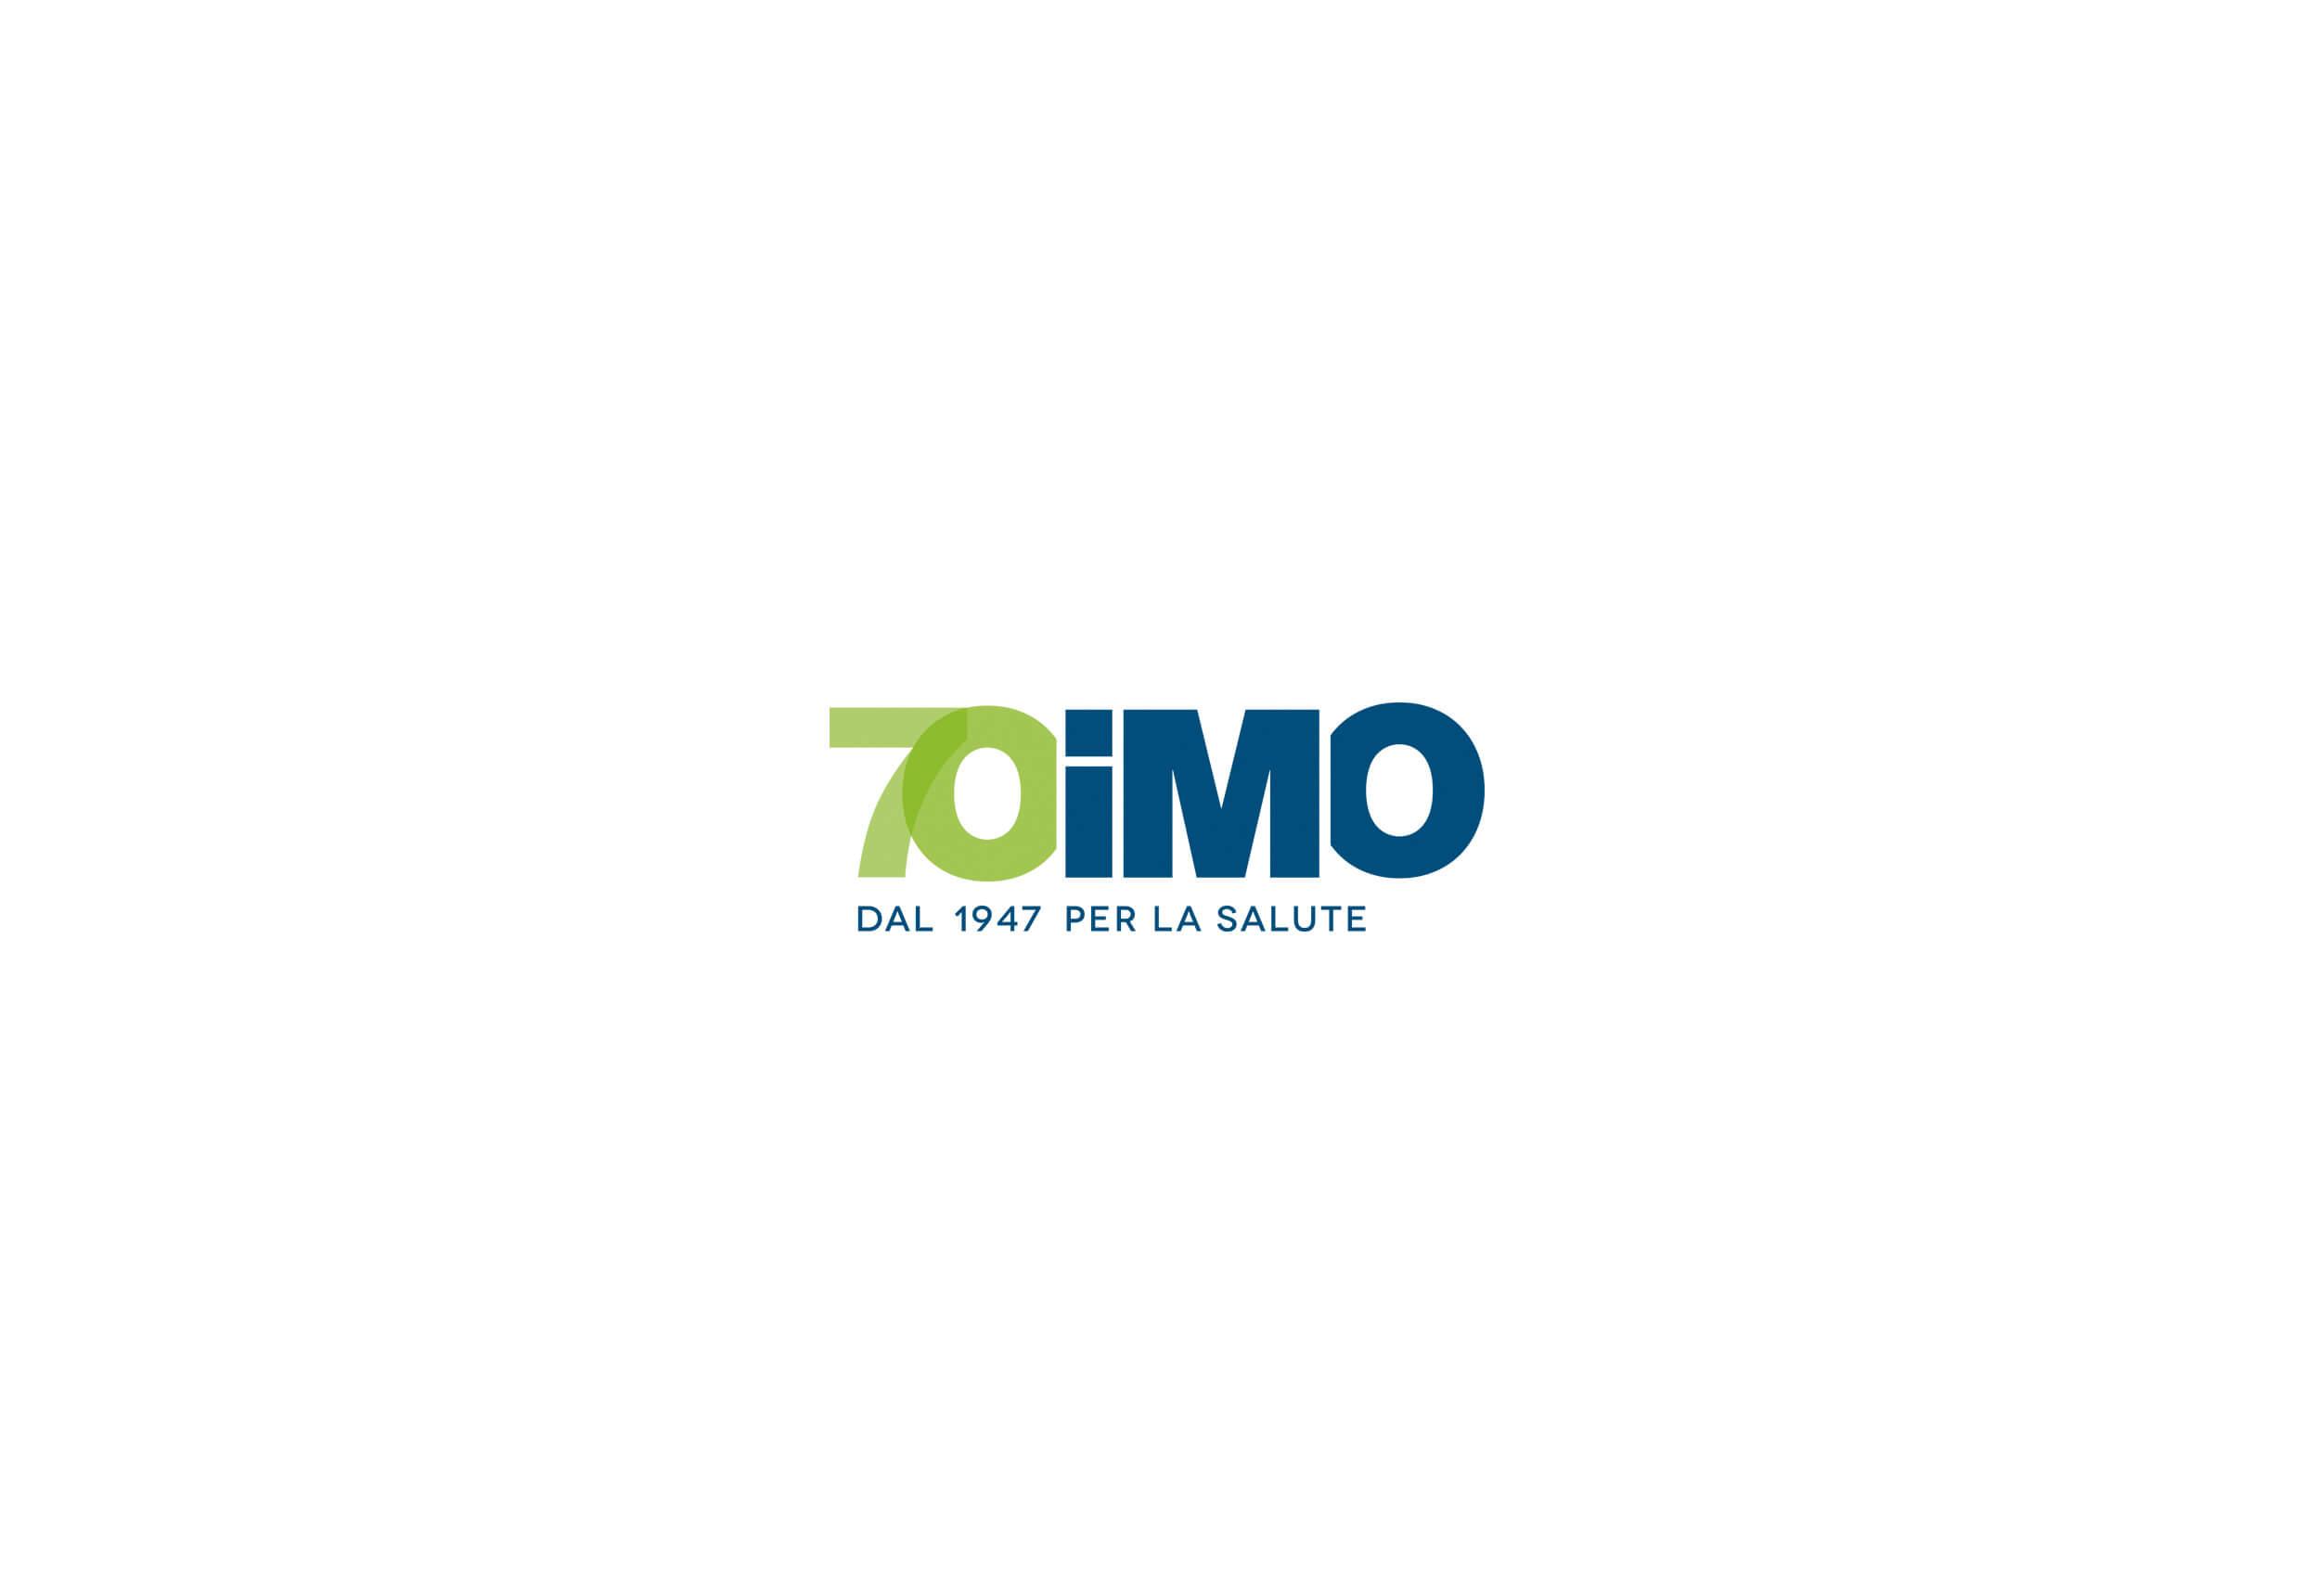 imo_70th_anniversary-logo